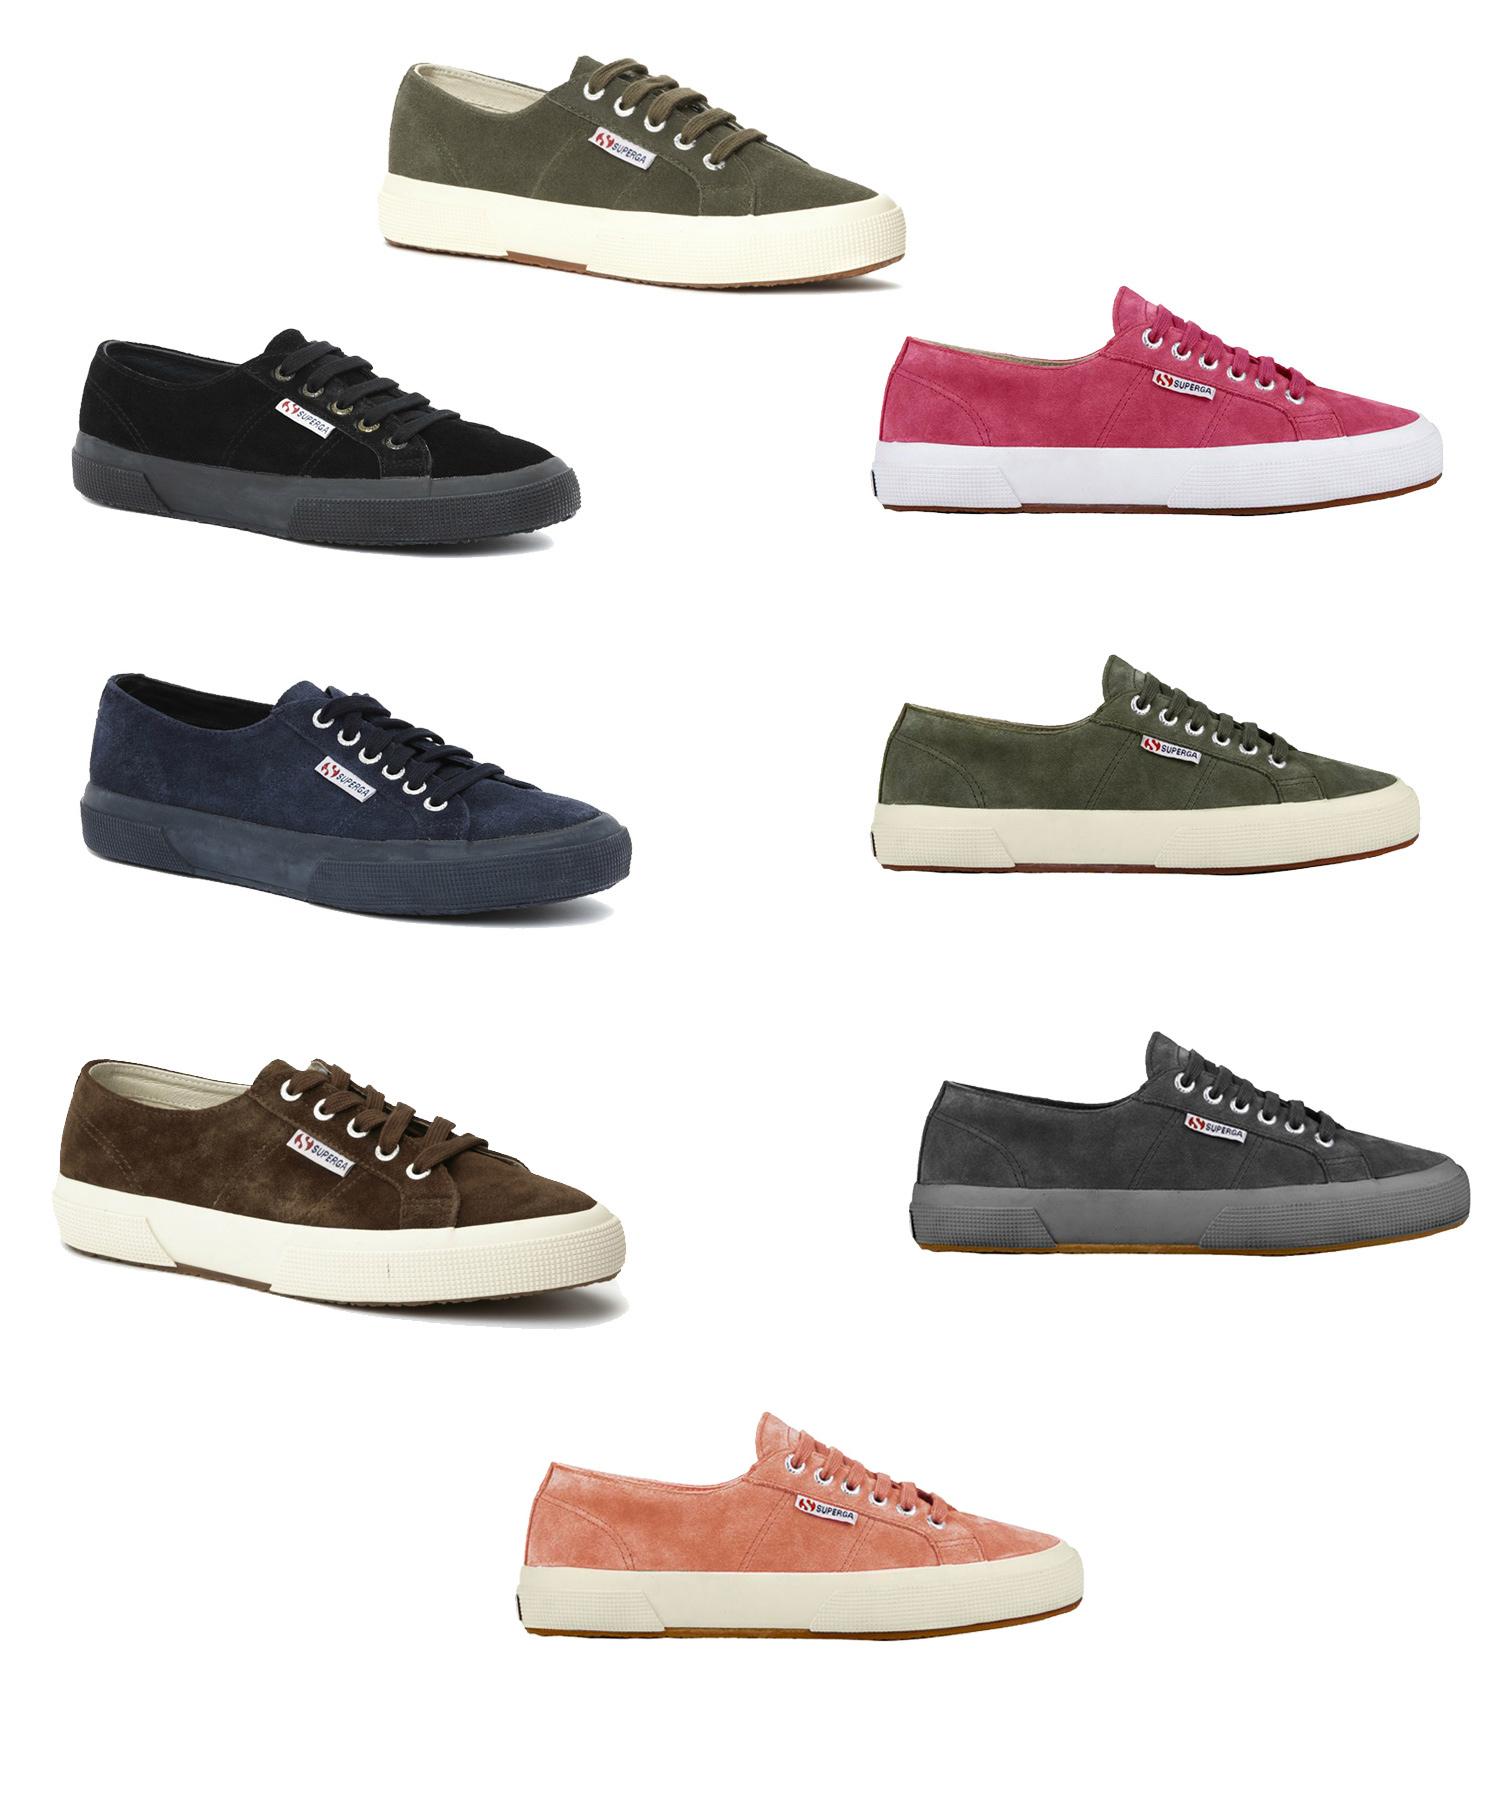 Superga Unisex 2750 Sueu Lace Up Suede Trainers Tennis Shoes ...